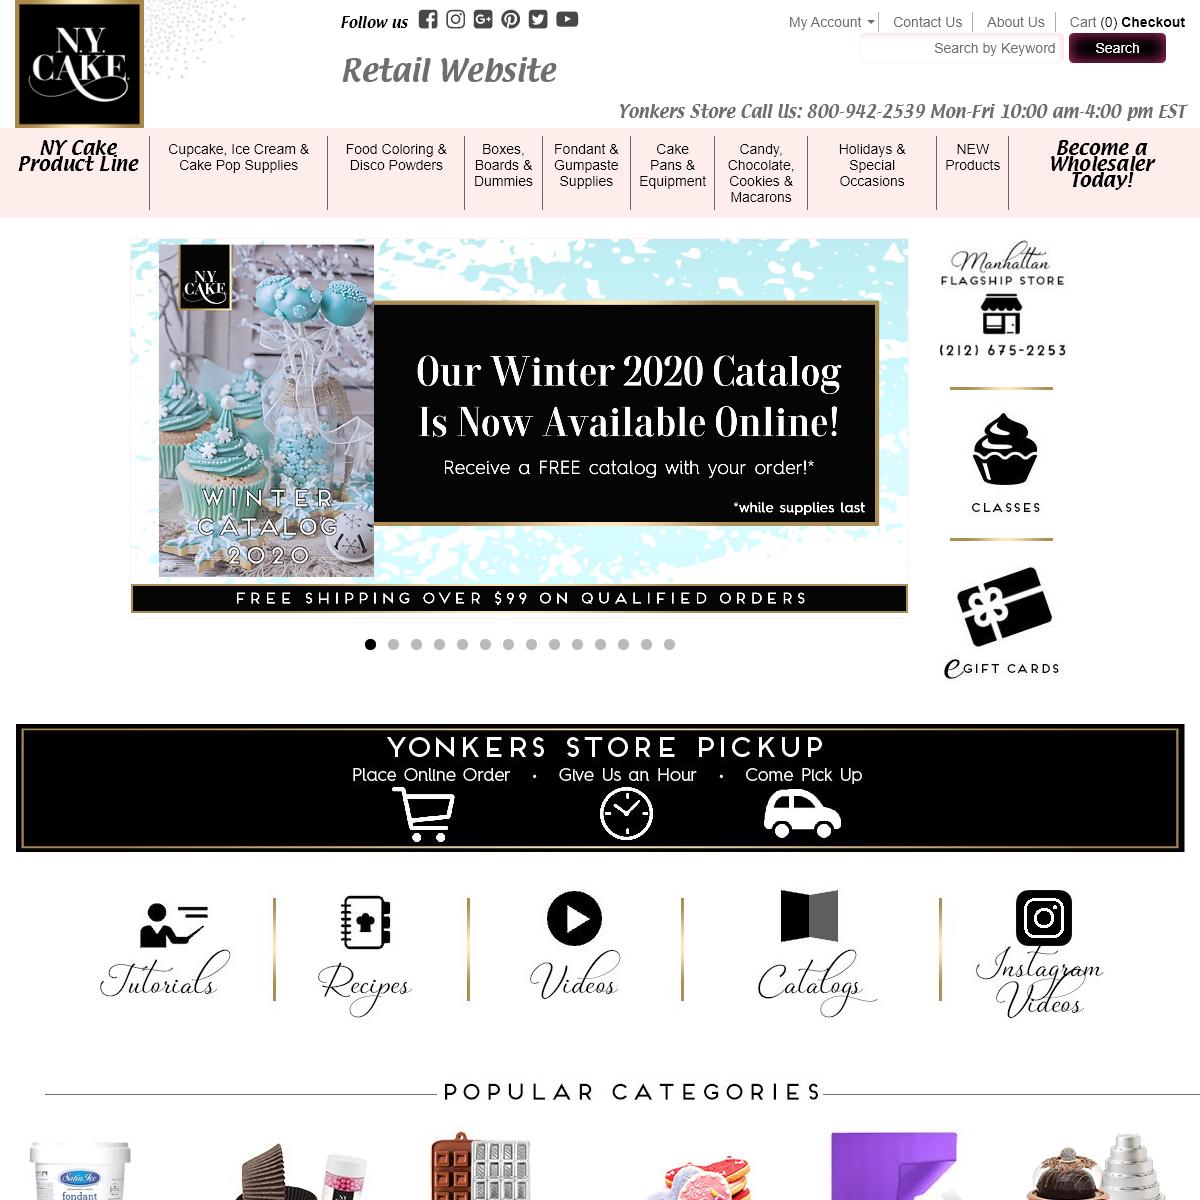 Cake Decorating and Baking Supplies - Online Baking Tools - NY Cake